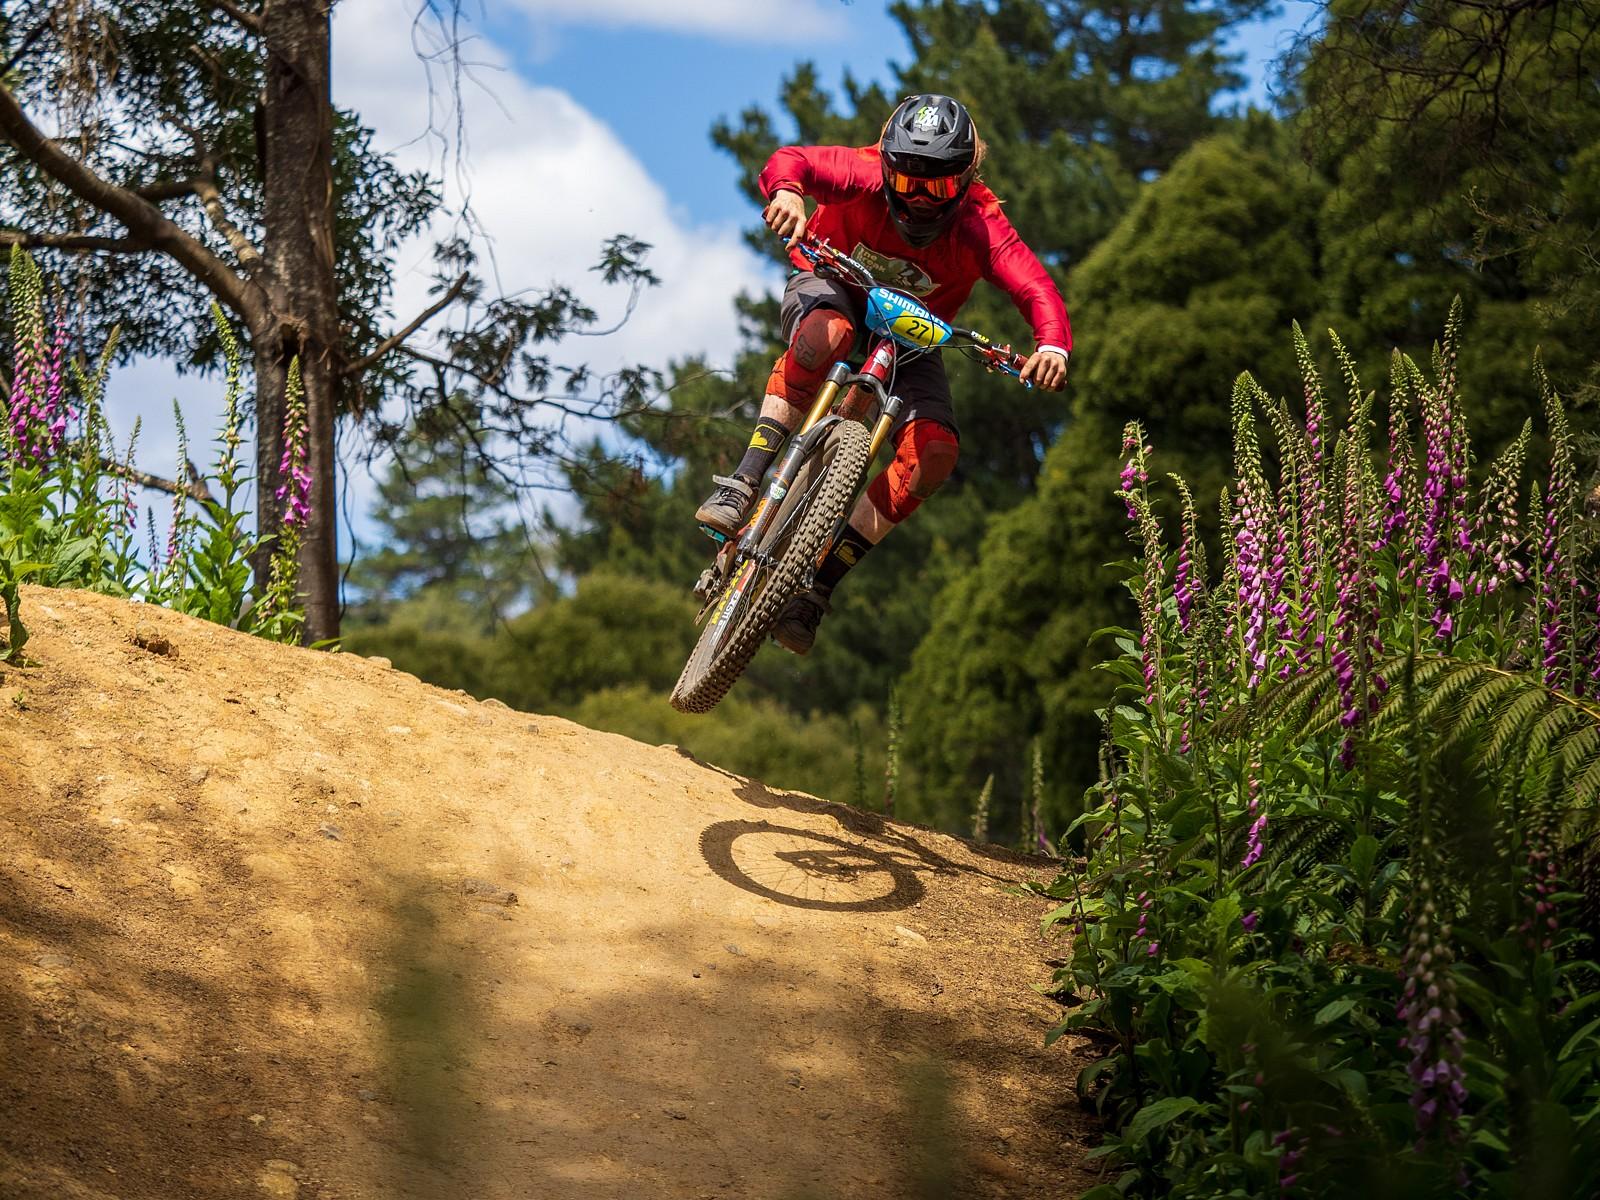 171119-Tassie-1510 - jack.fletcher86 - Mountain Biking Pictures - Vital MTB